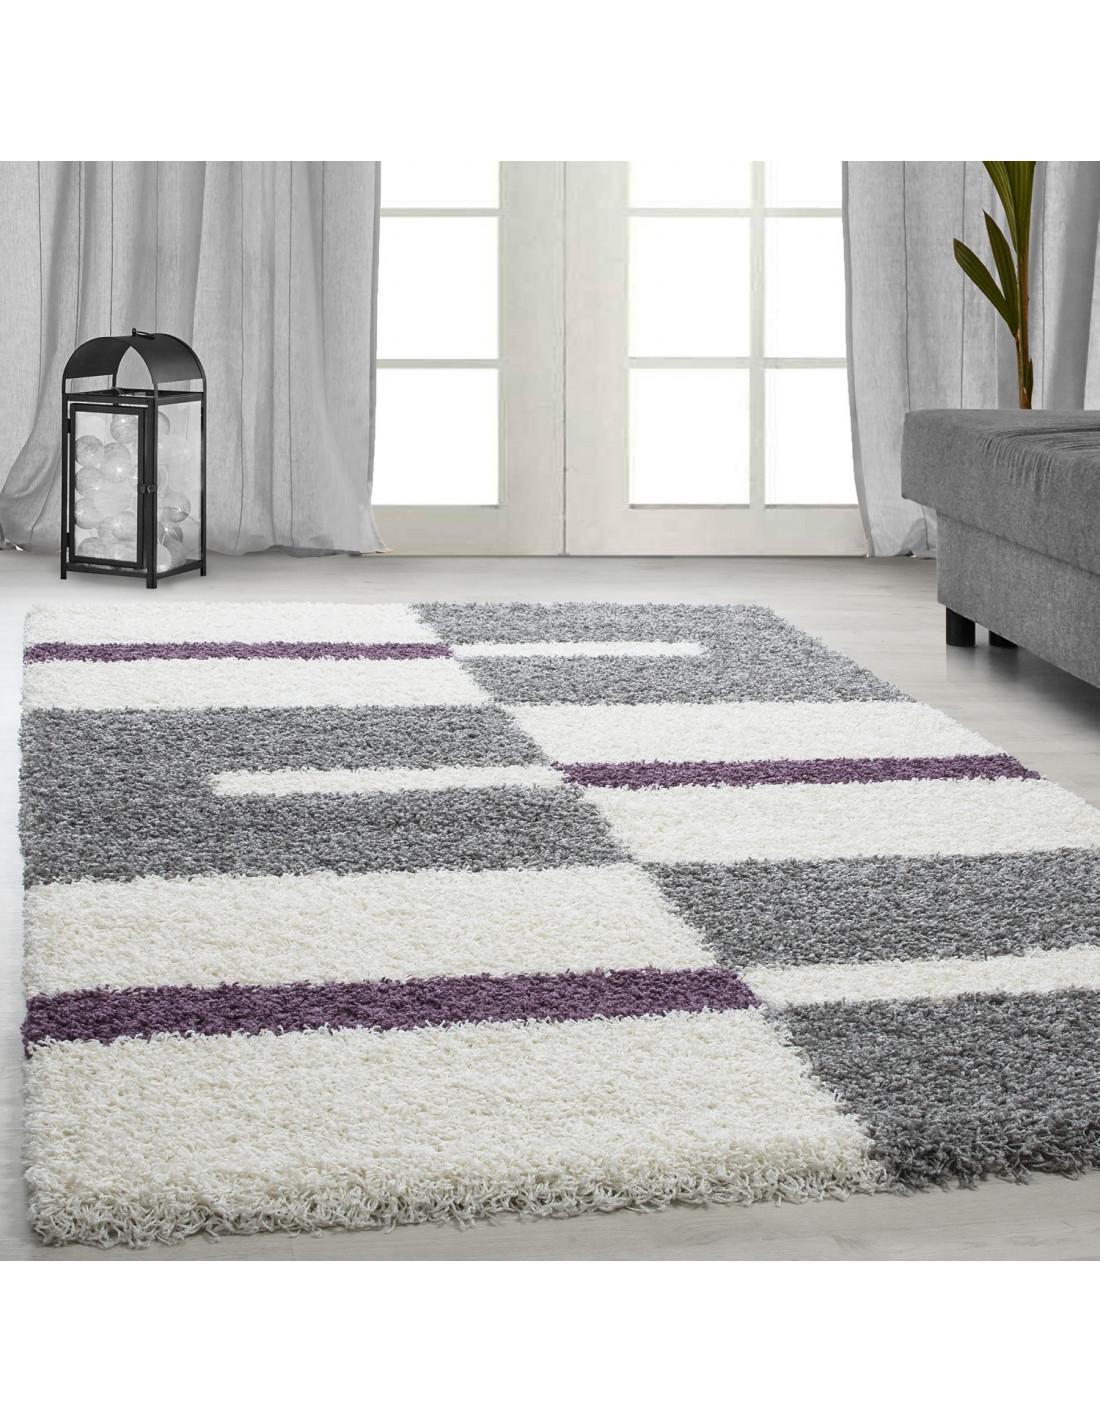 Shaggy carpet, pile height 3cm, gray-white-purple